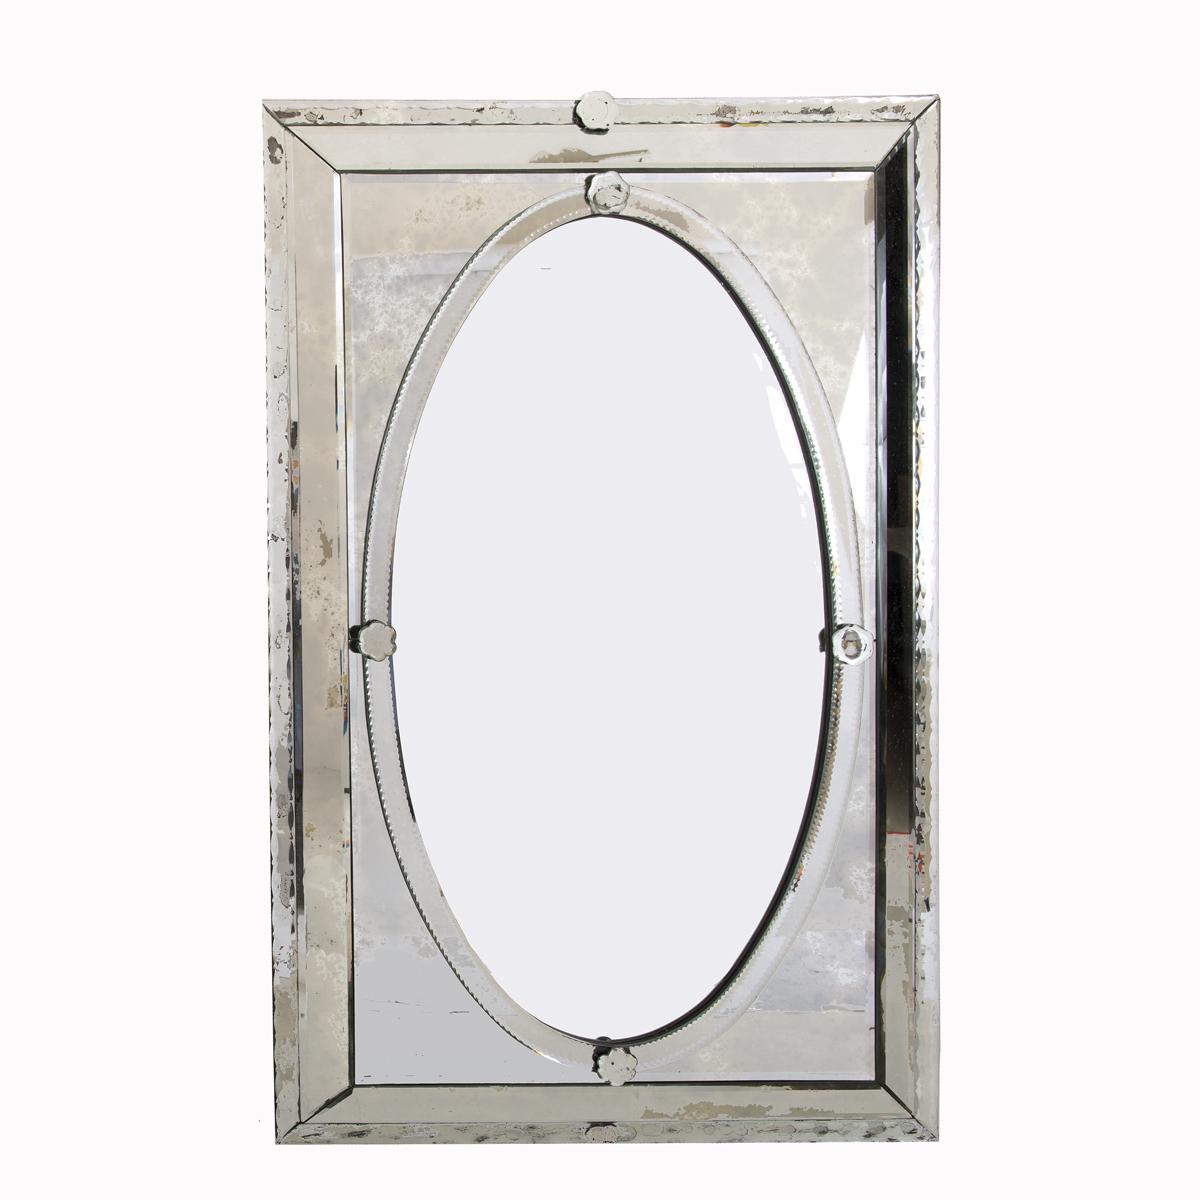 mirror - multi-sided.jpg